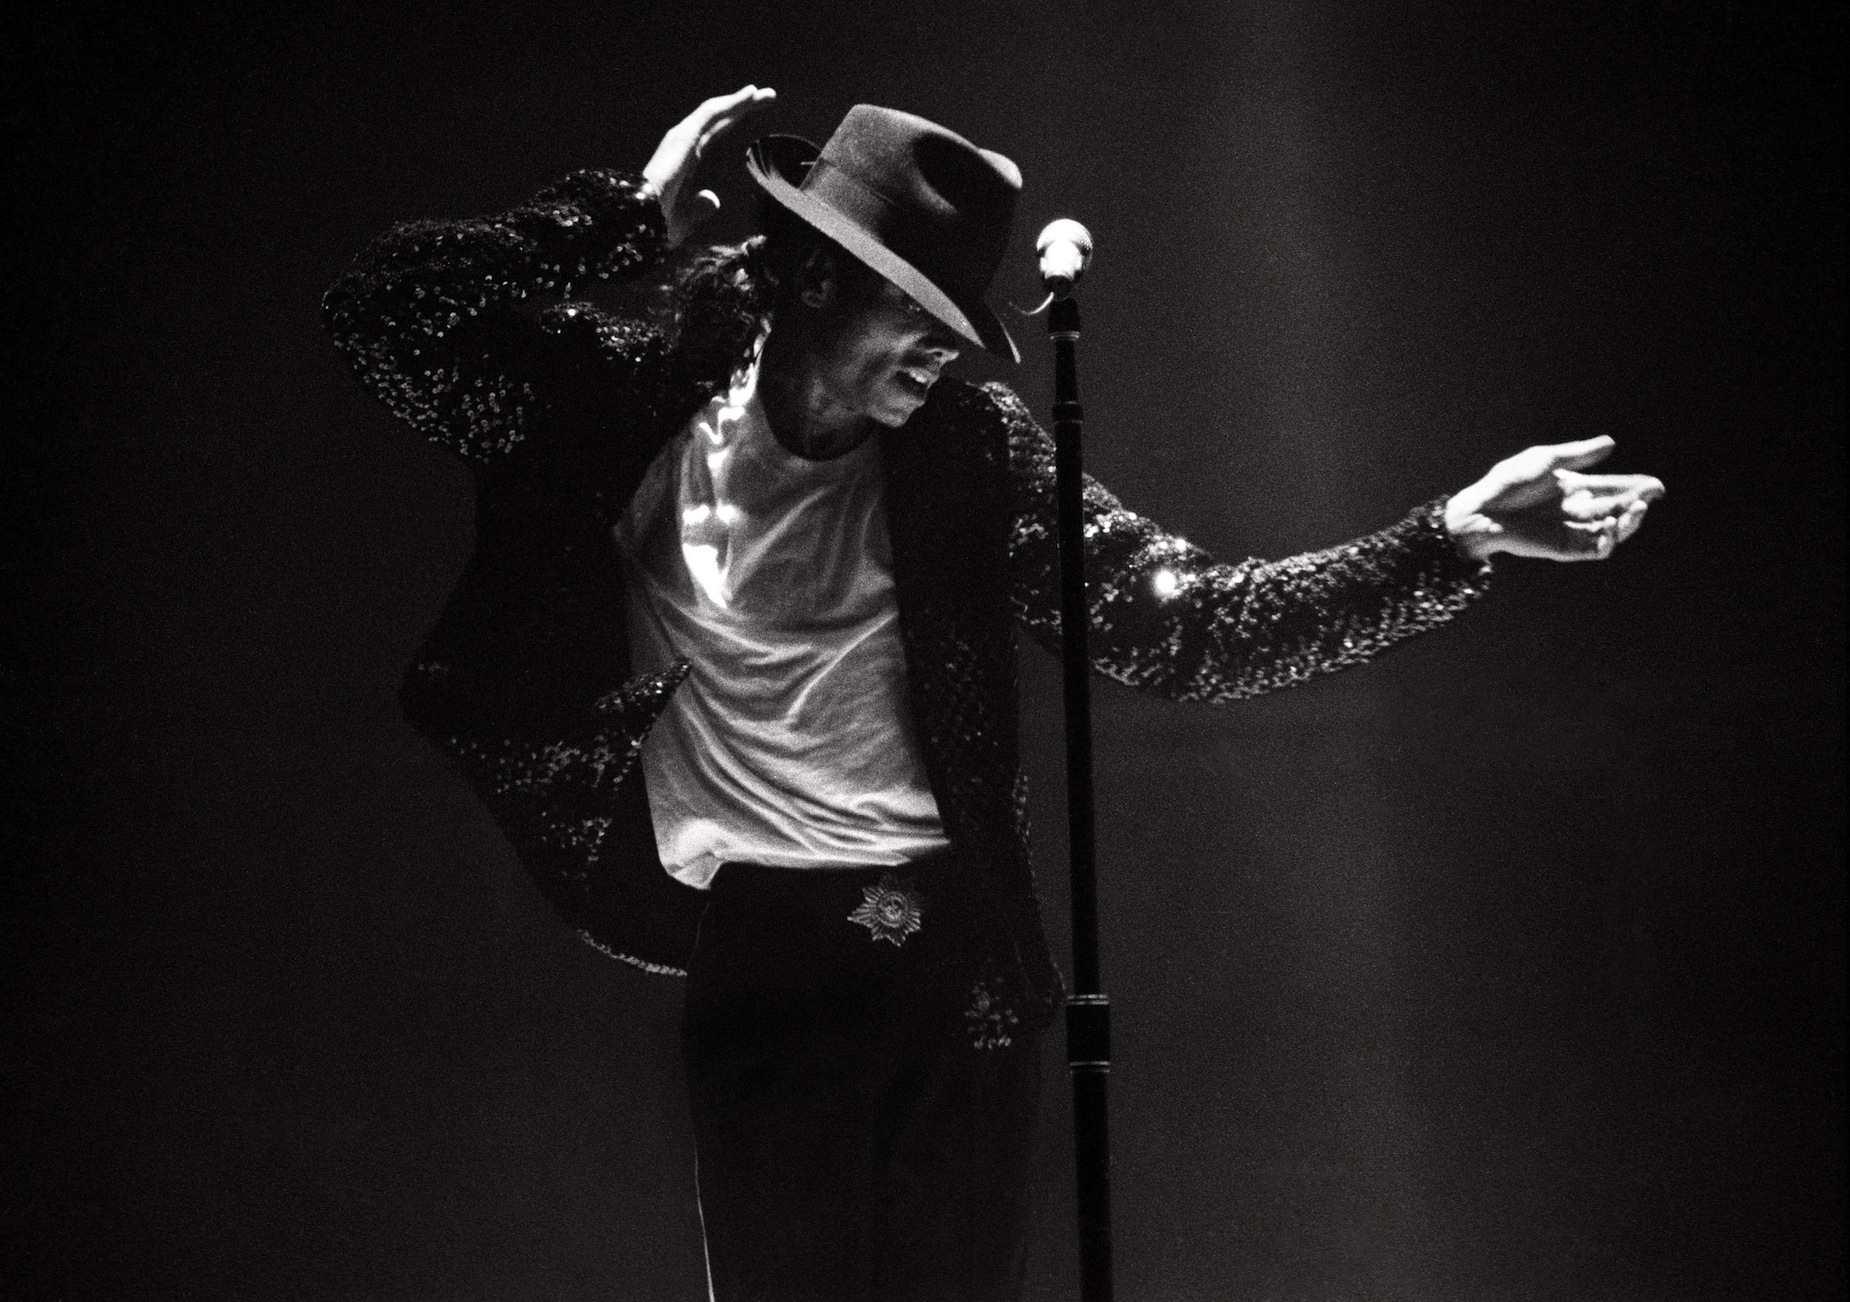 Top 10 Michael Jackson Samples in Hip-Hop